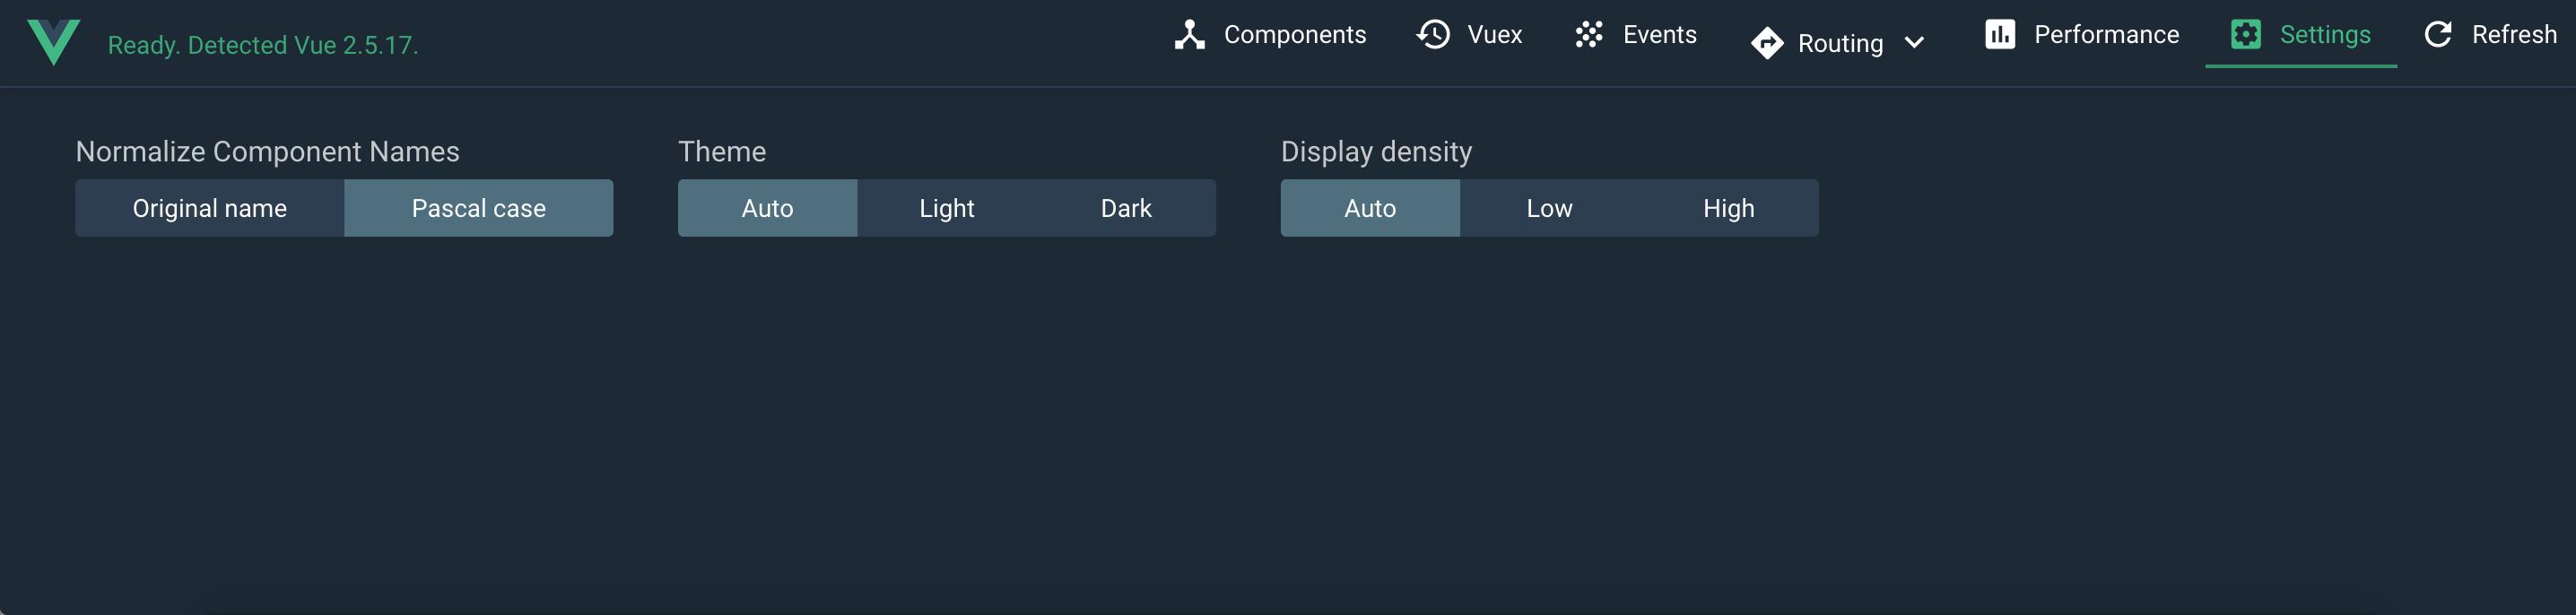 settings-tab.png